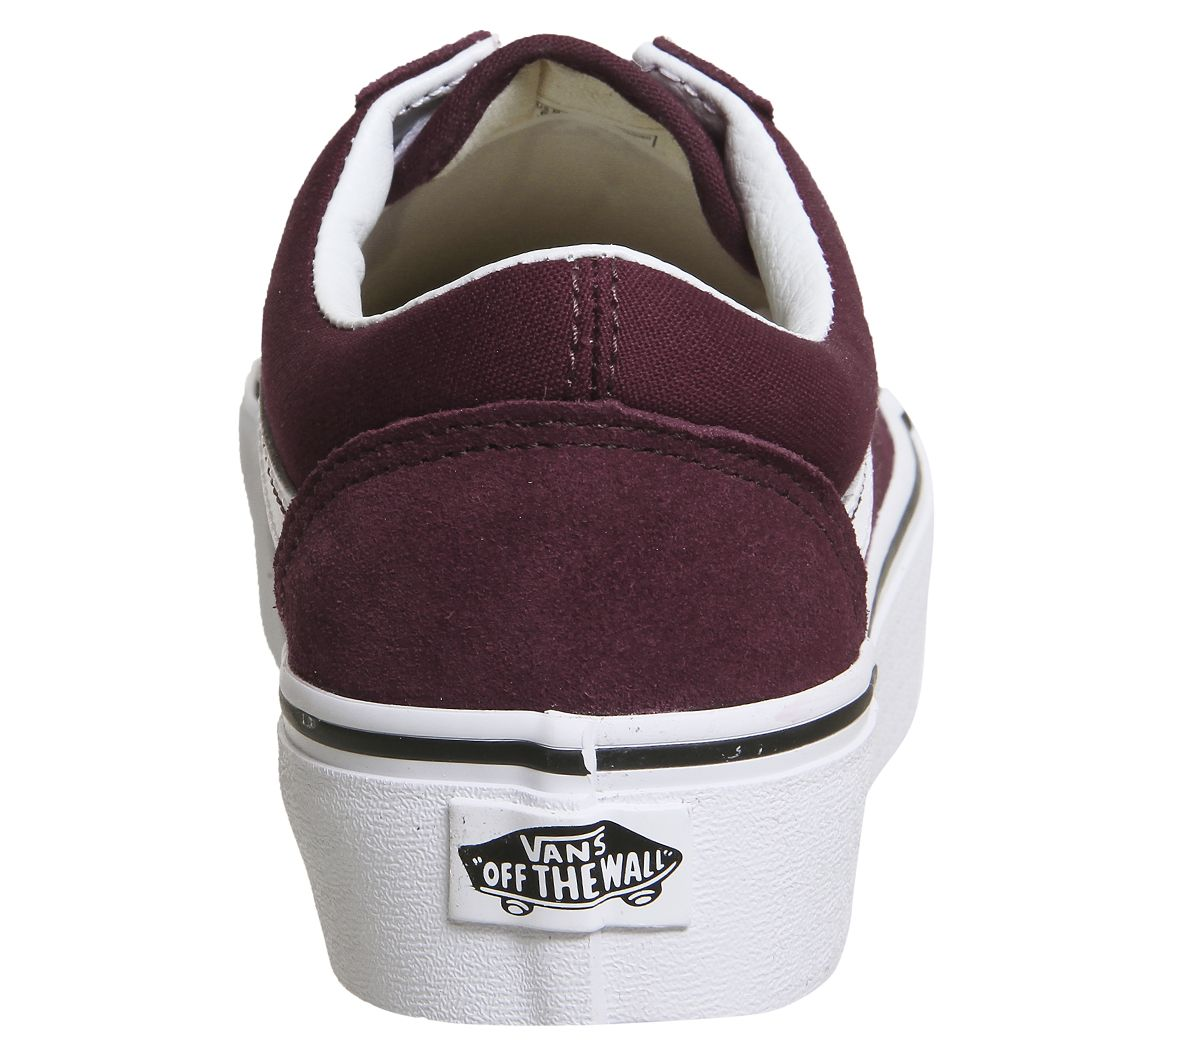 da33f85445bb Vans Old Skool Platforms Port Royale White - Hers trainers